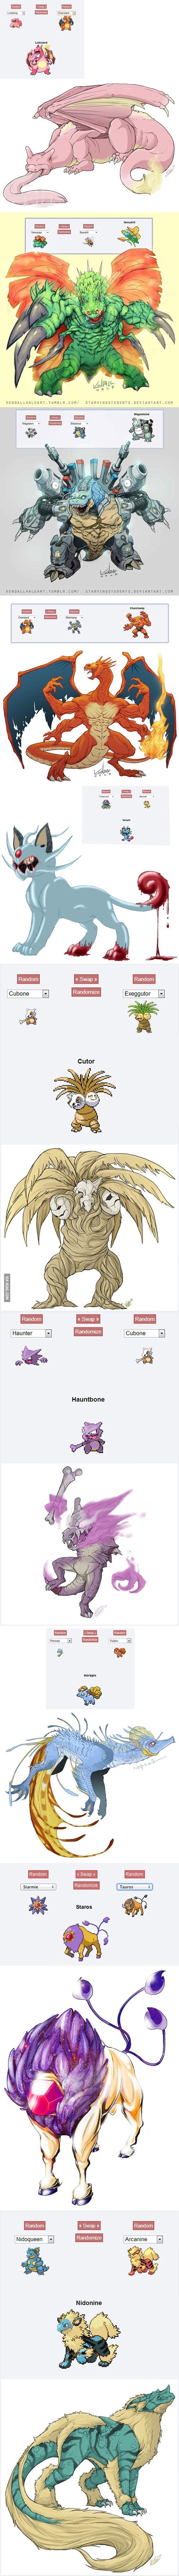 Pokemon Fusion Art: